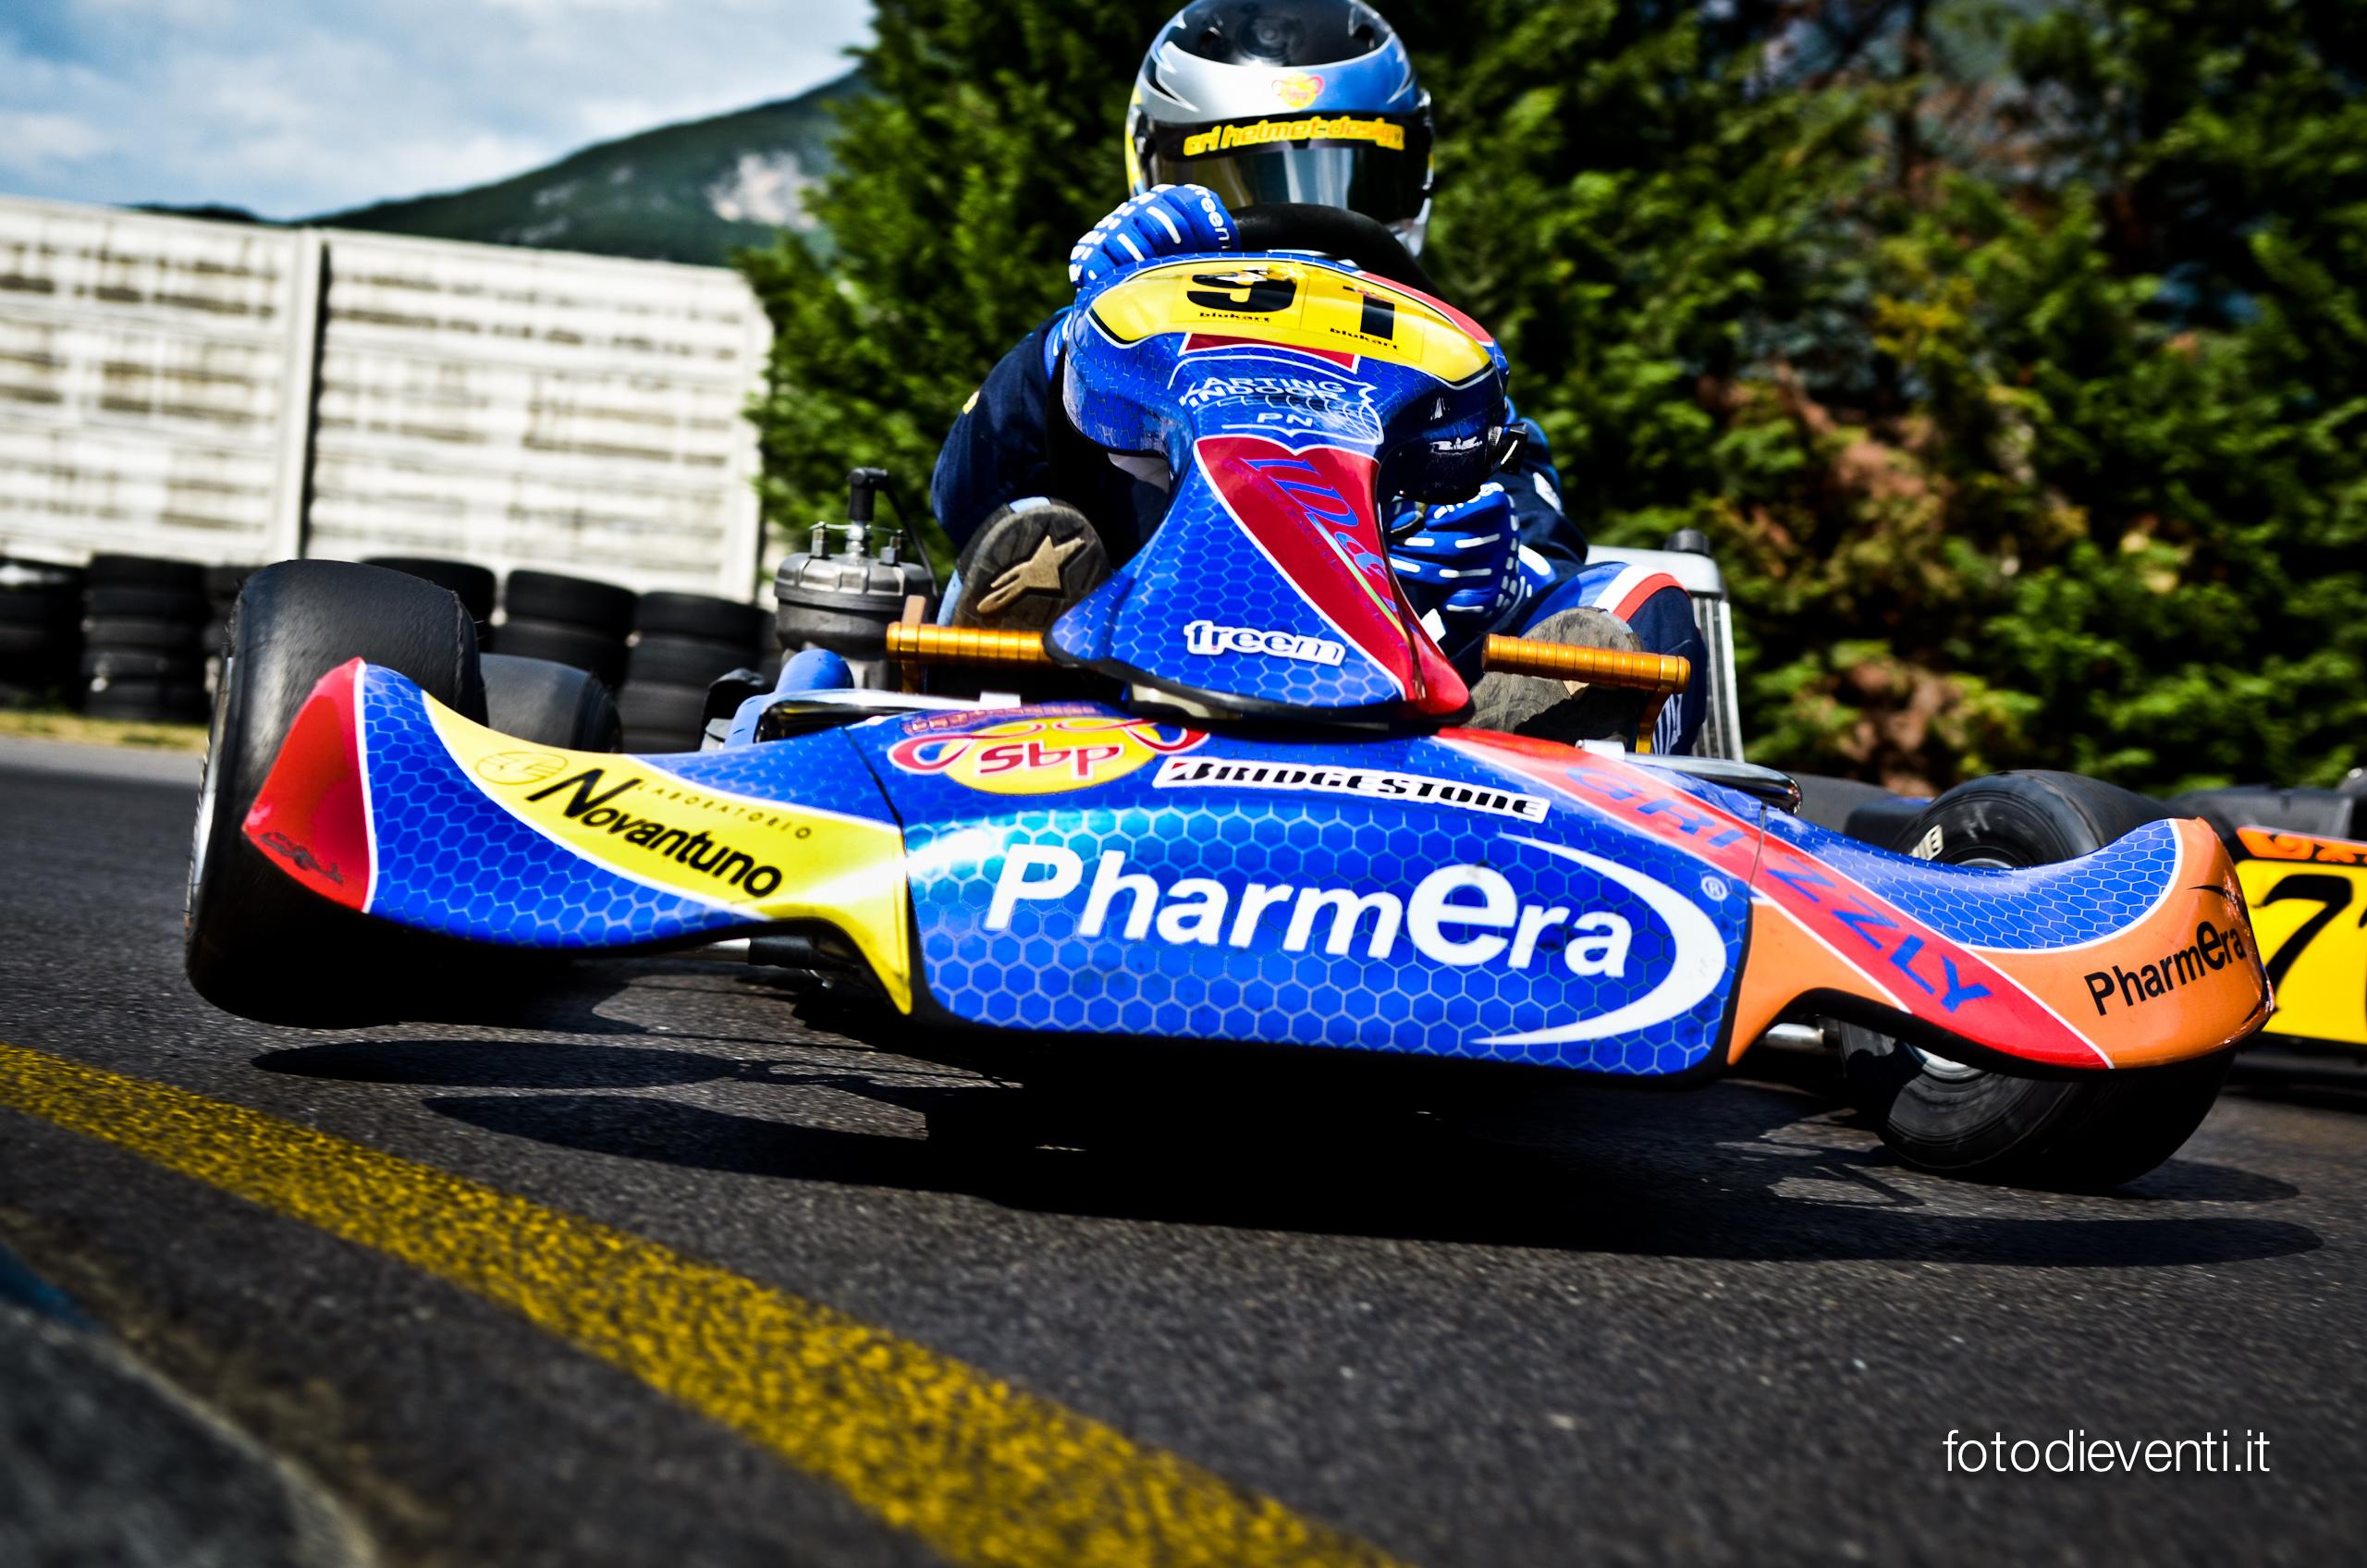 Championkart @ Ala